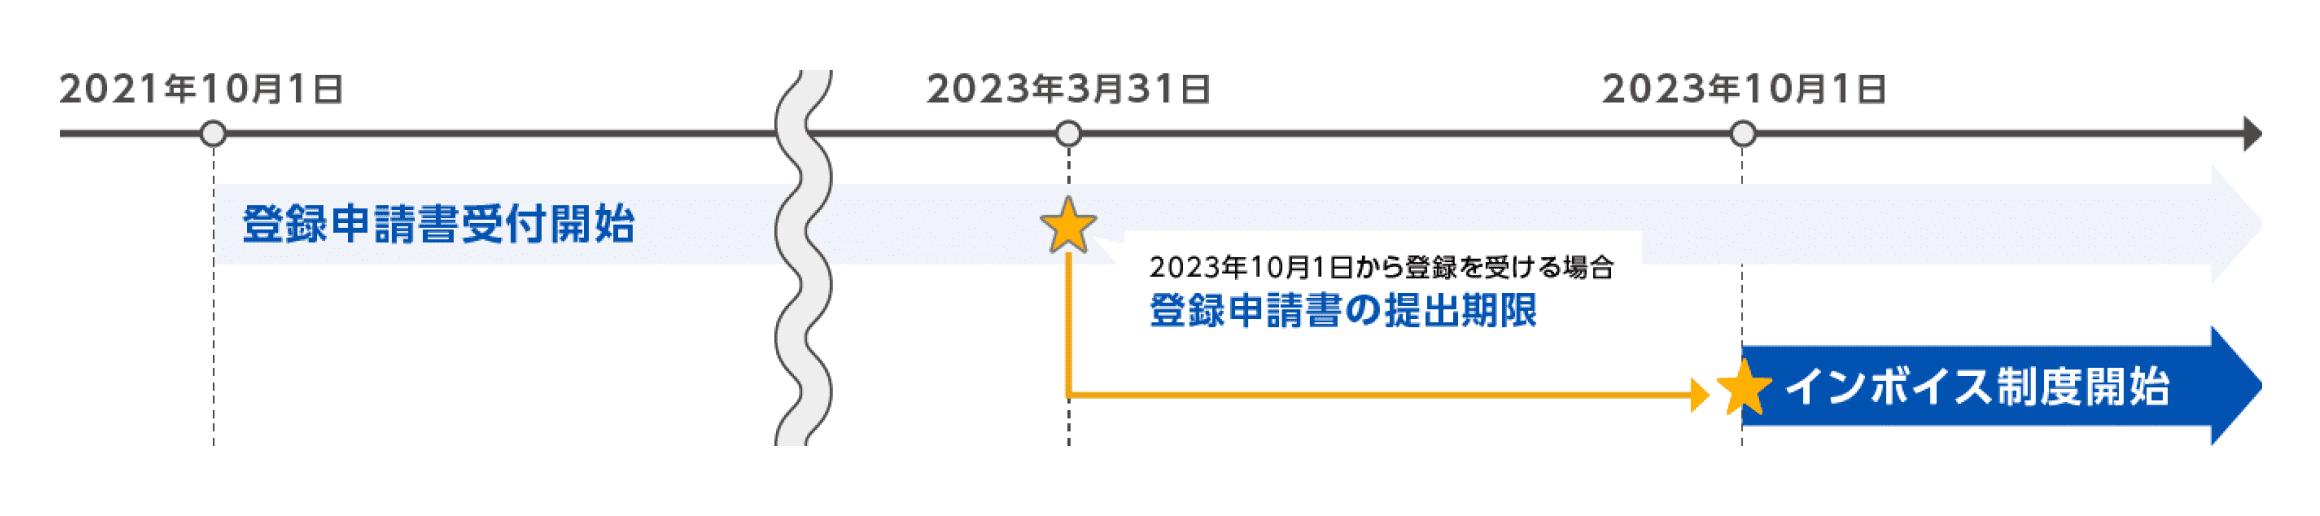 図: 申請書の提出期間